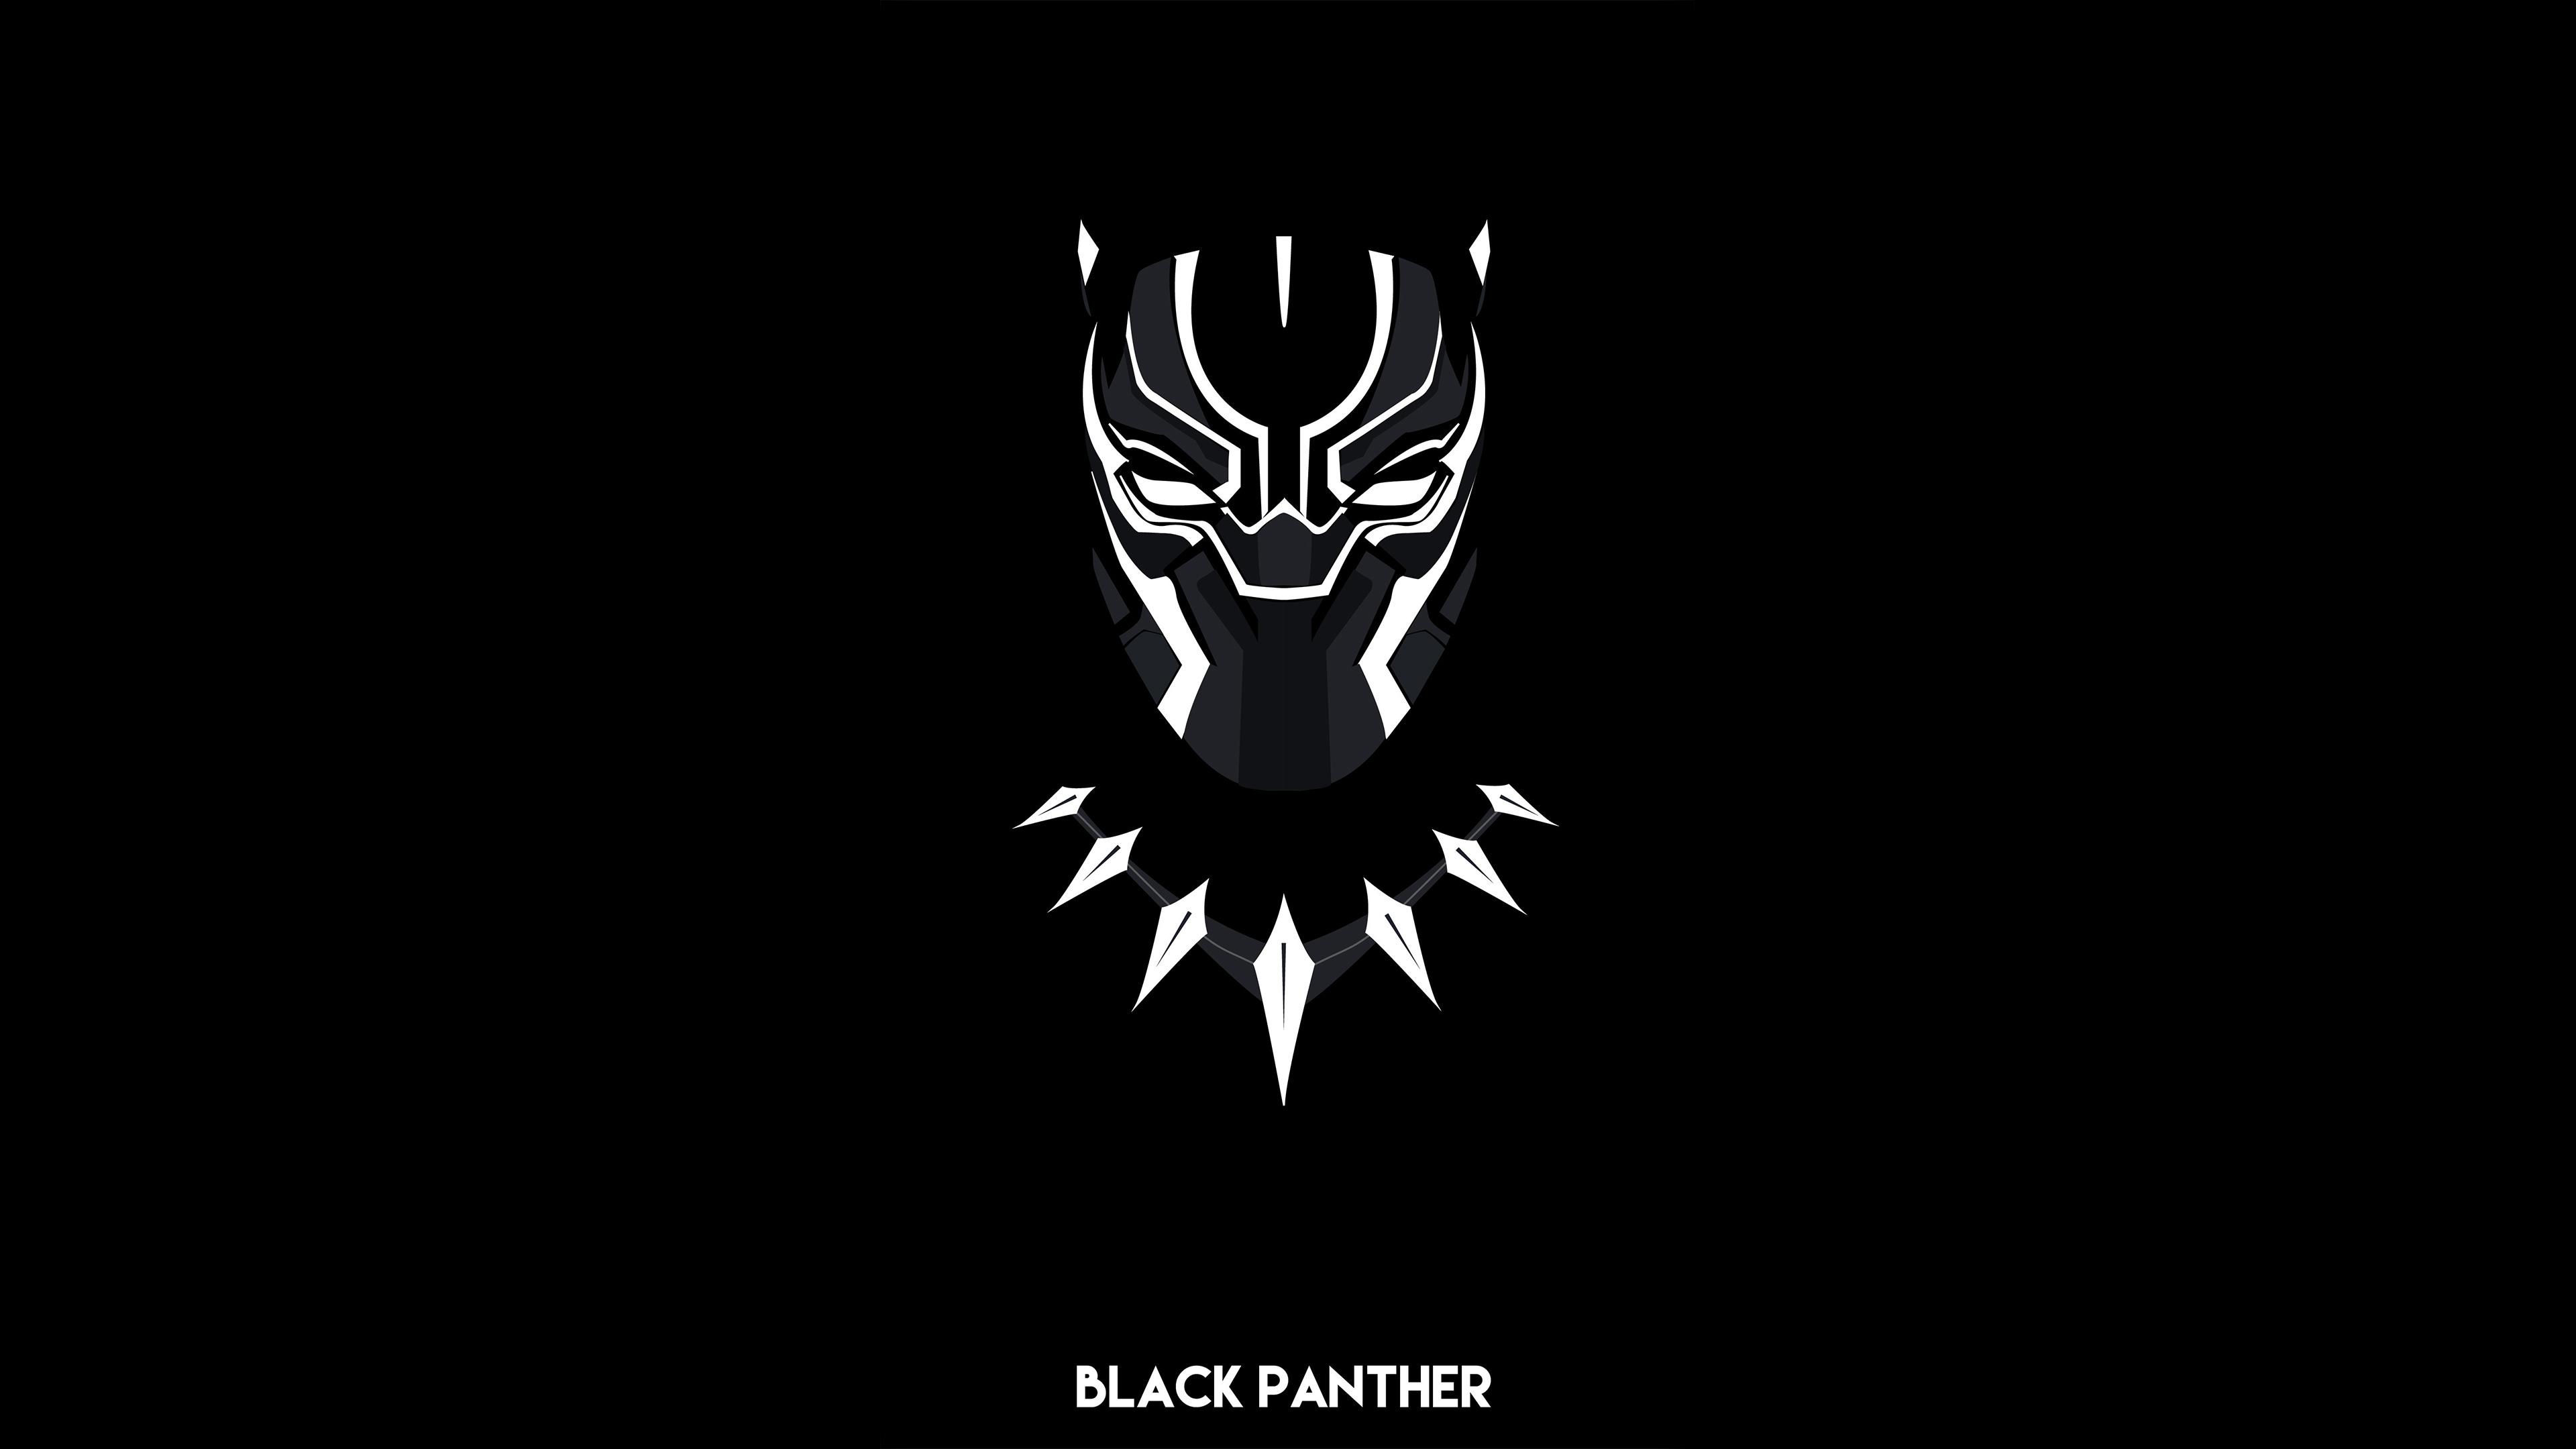 1440x2960 Black Panther Minimal 4k Samsung Galaxy Note 98